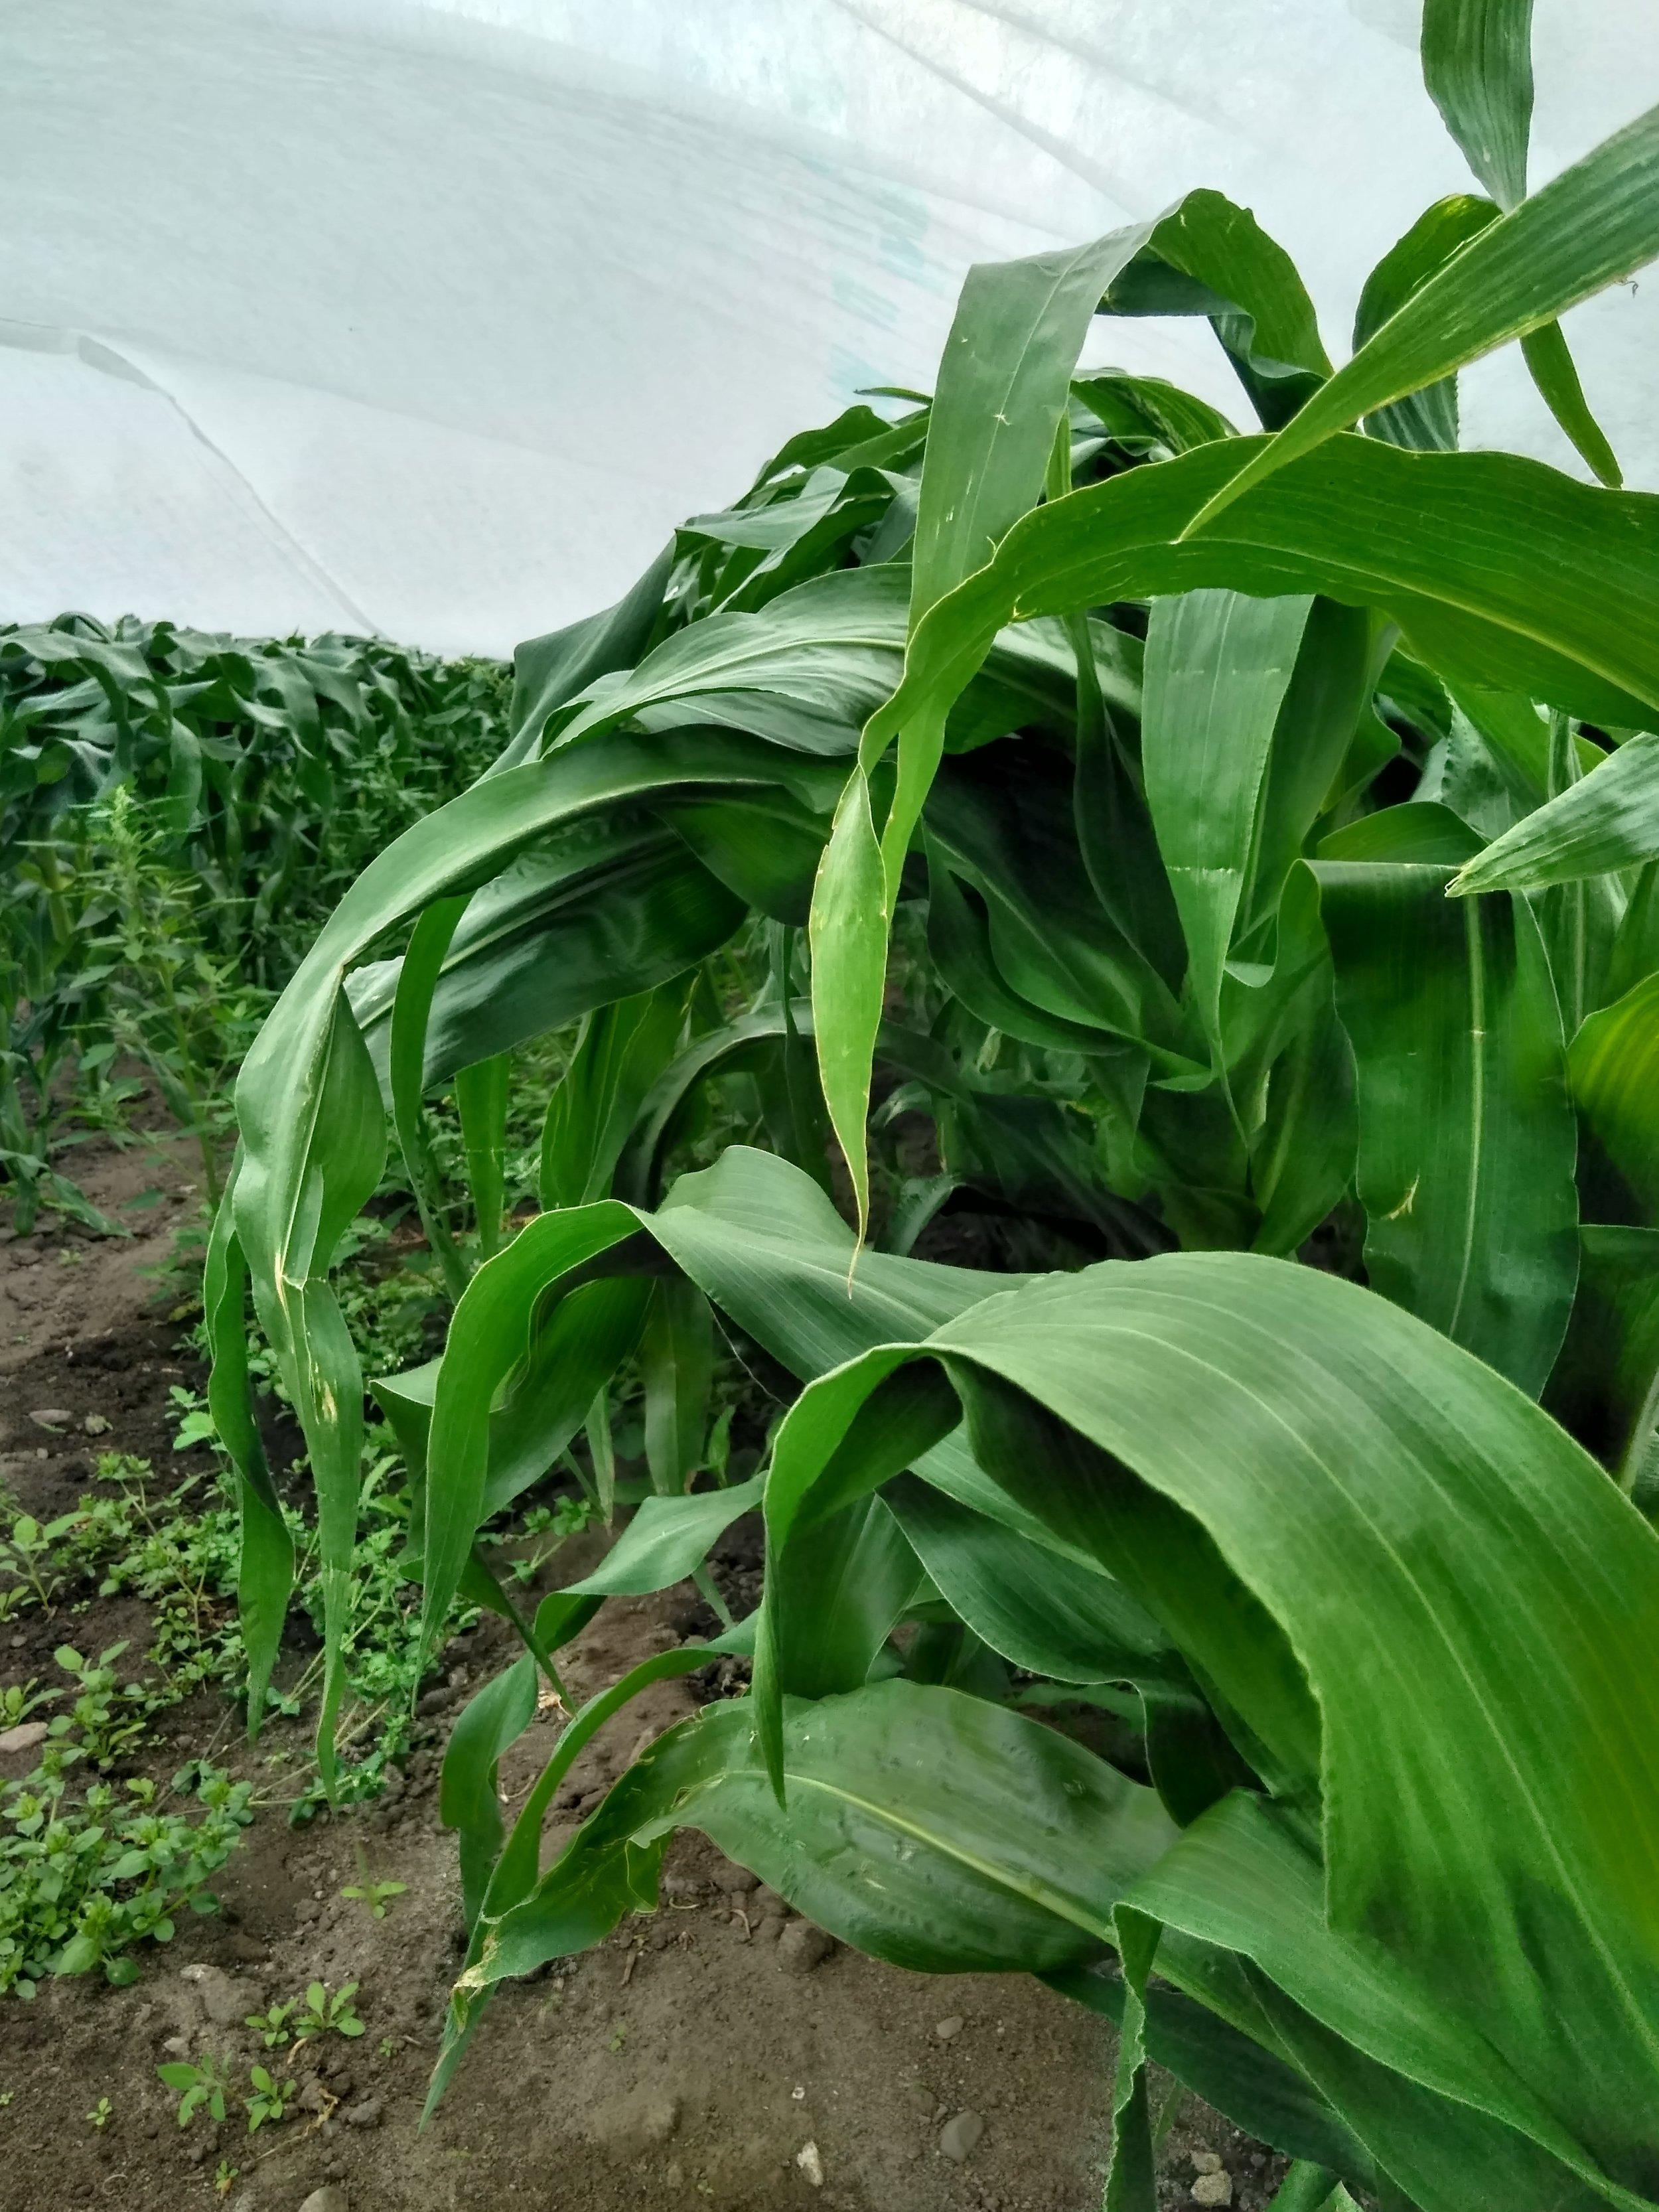 Maisplantene strekker seg masse i juli